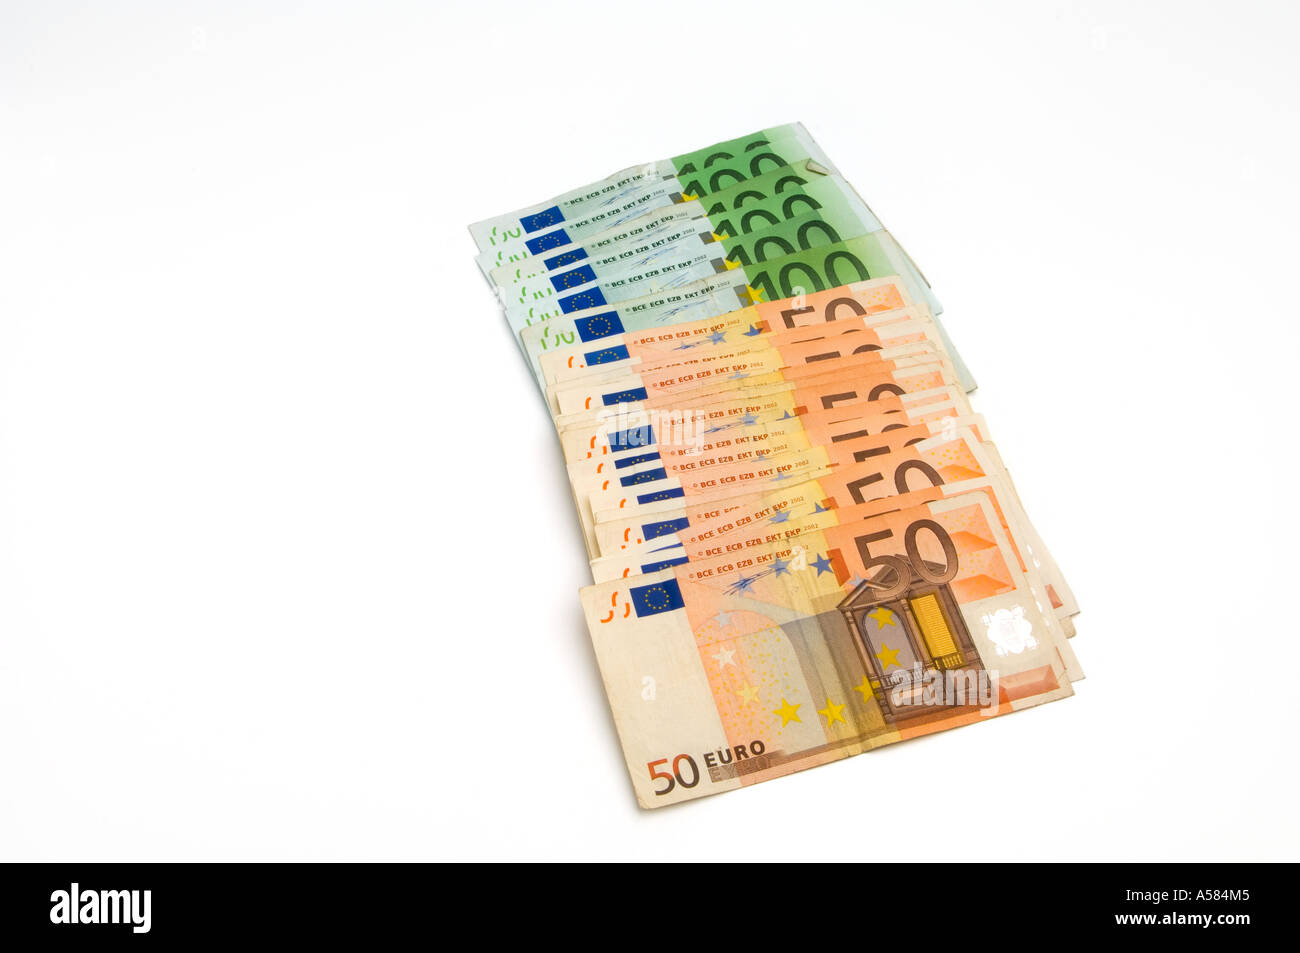 1500 In Euros